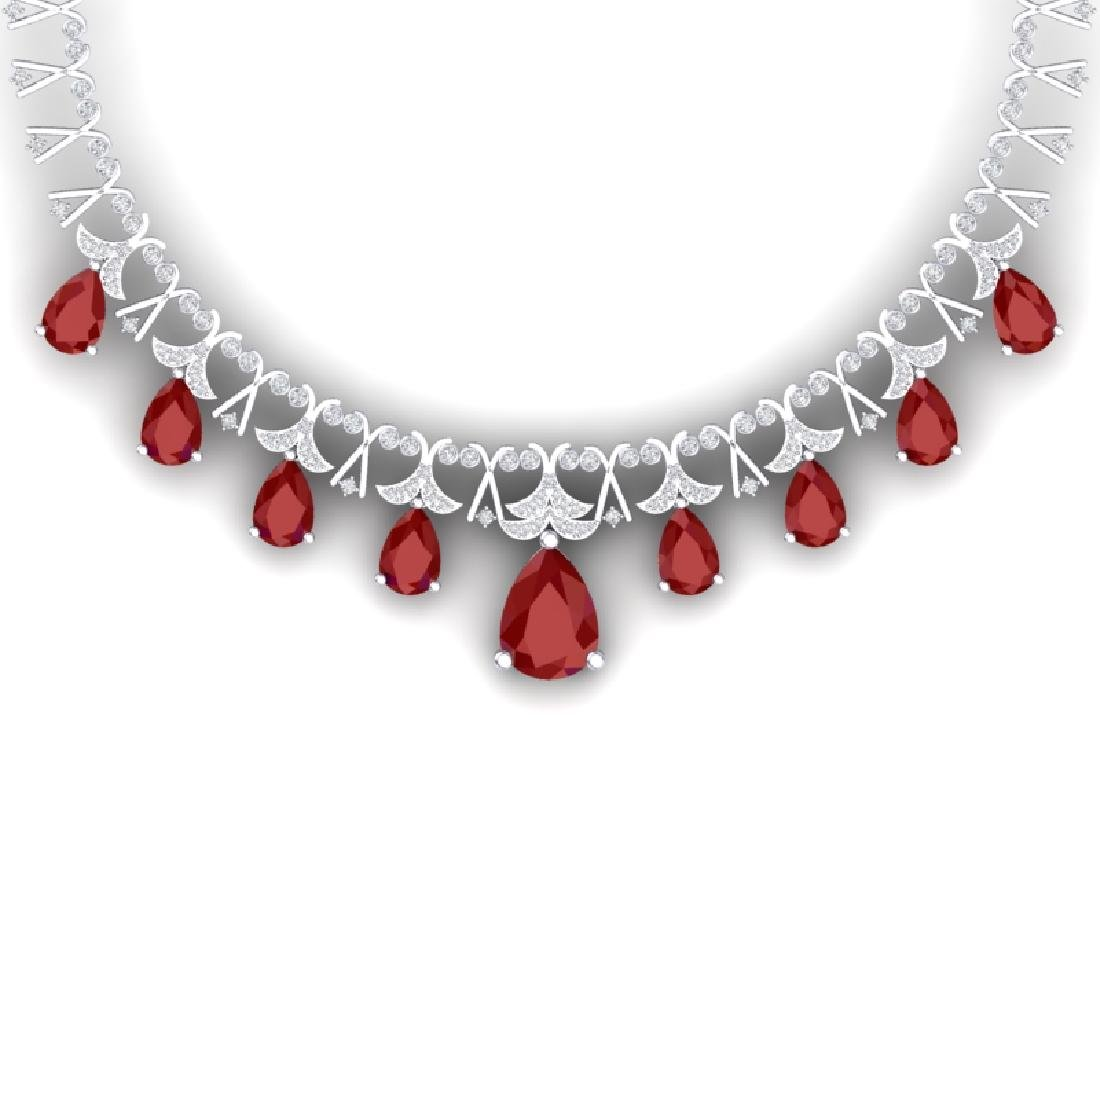 56.94 CTW Royalty Ruby & VS Diamond Necklace 18K White